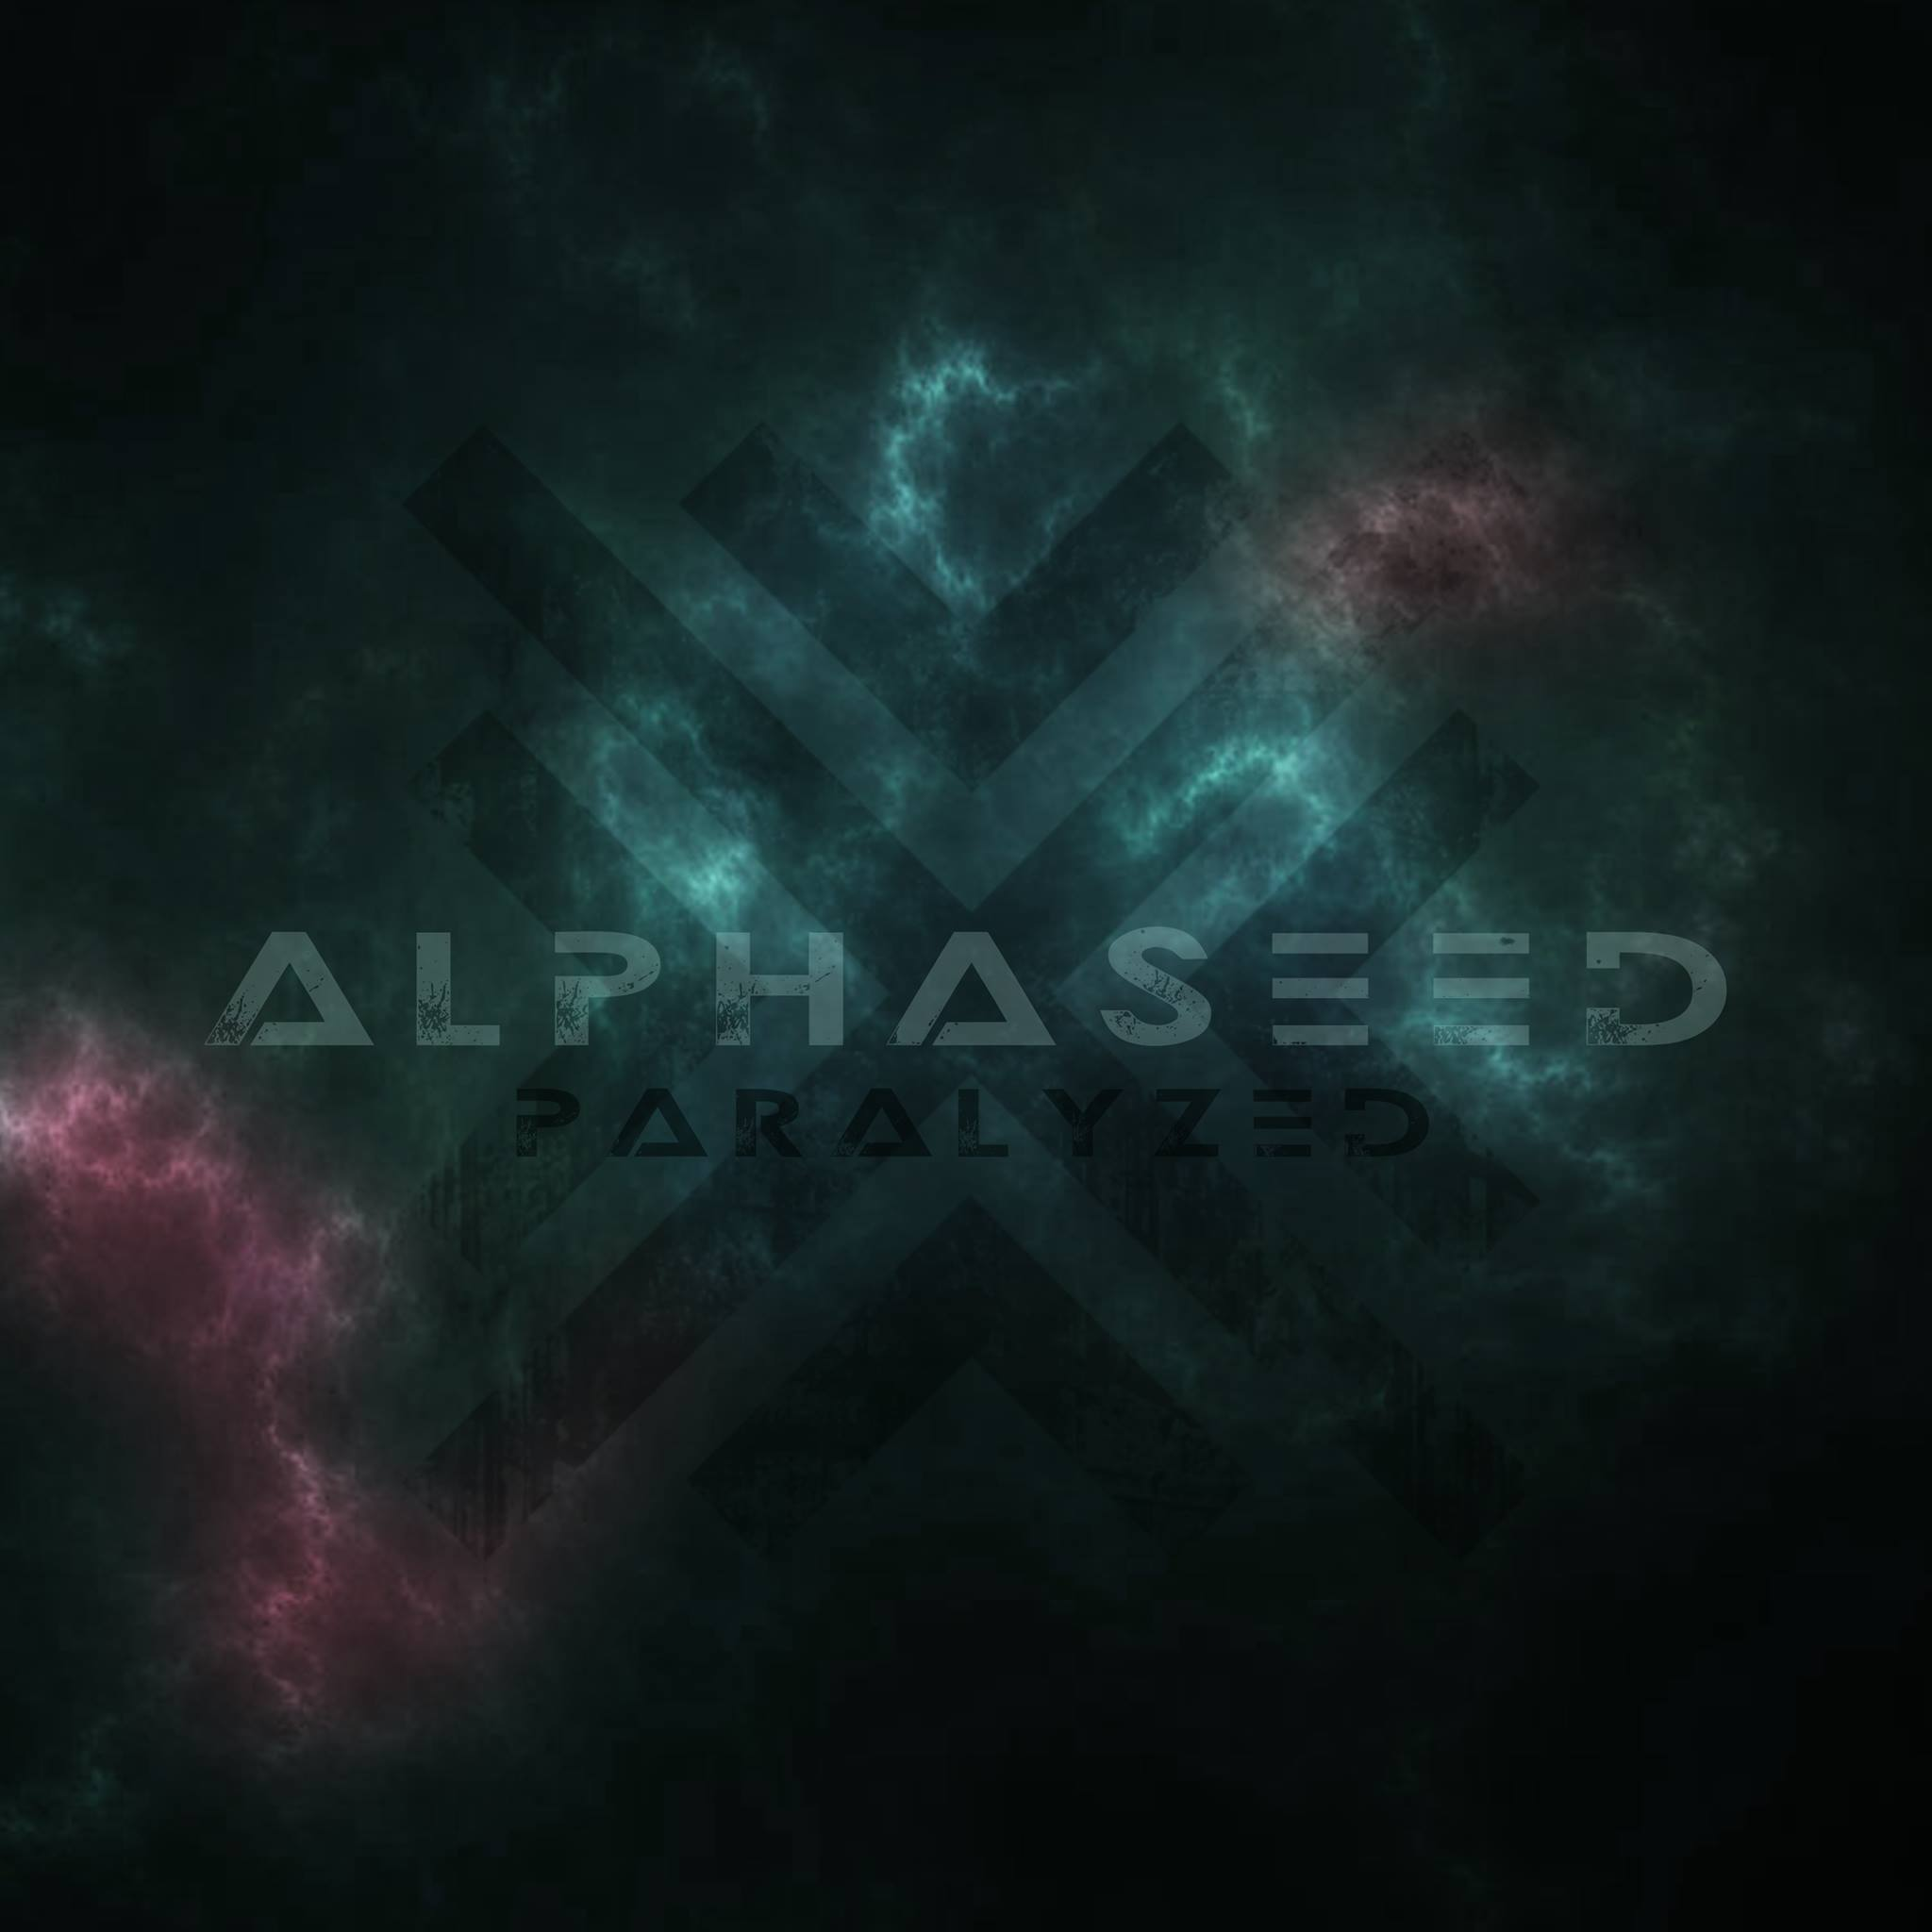 Alpha Seed - Broken [single] (2017)